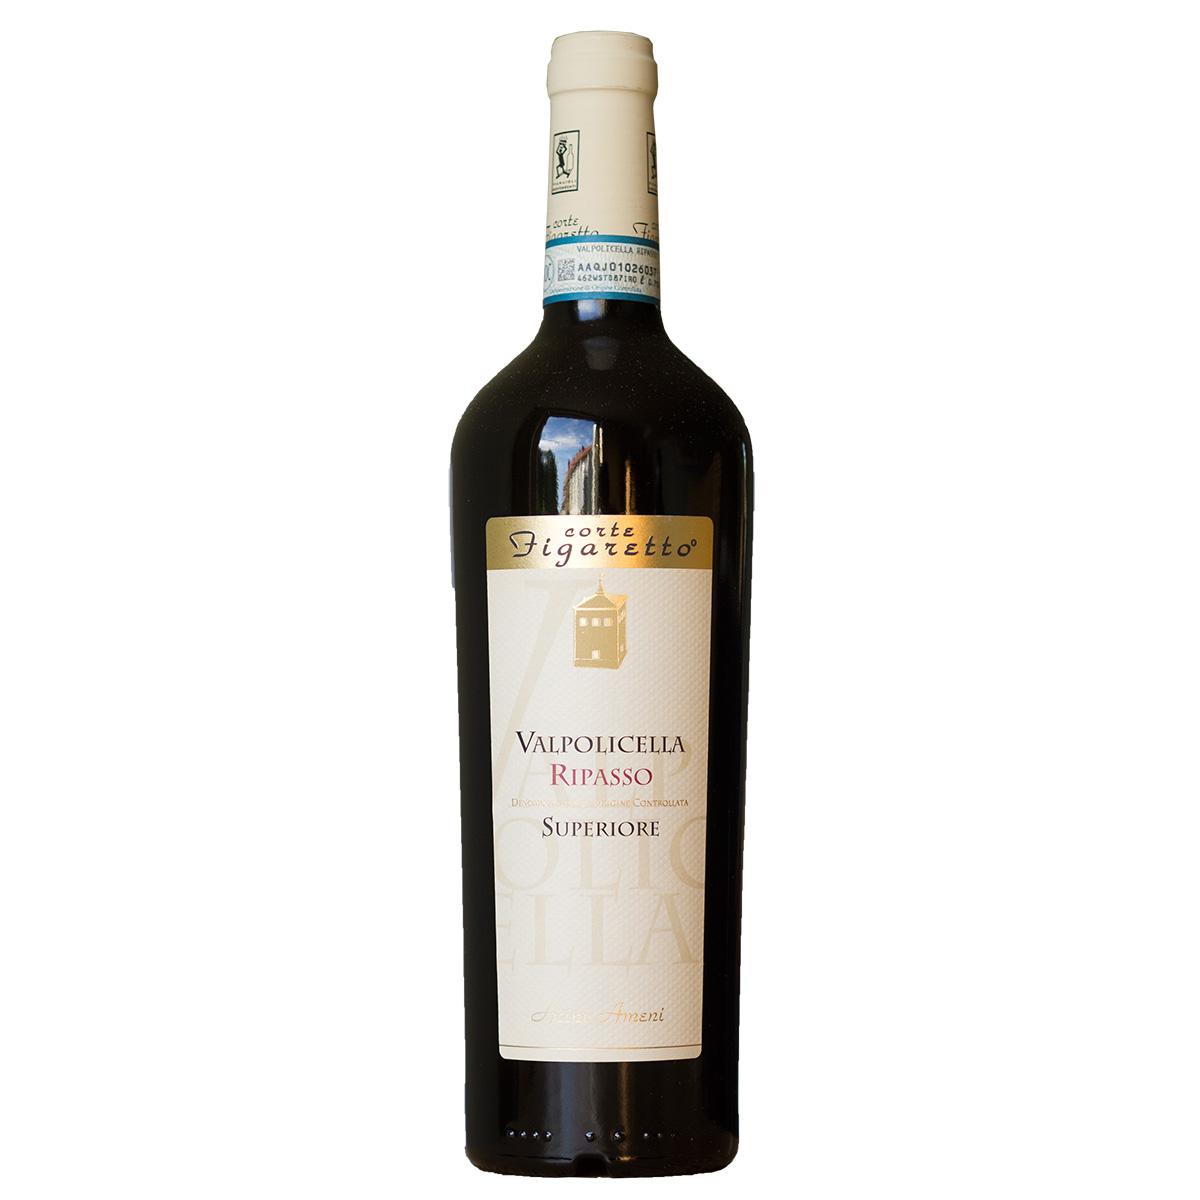 Italien Rotwein Valpolicella Ripasso Superiore Acini Ameni